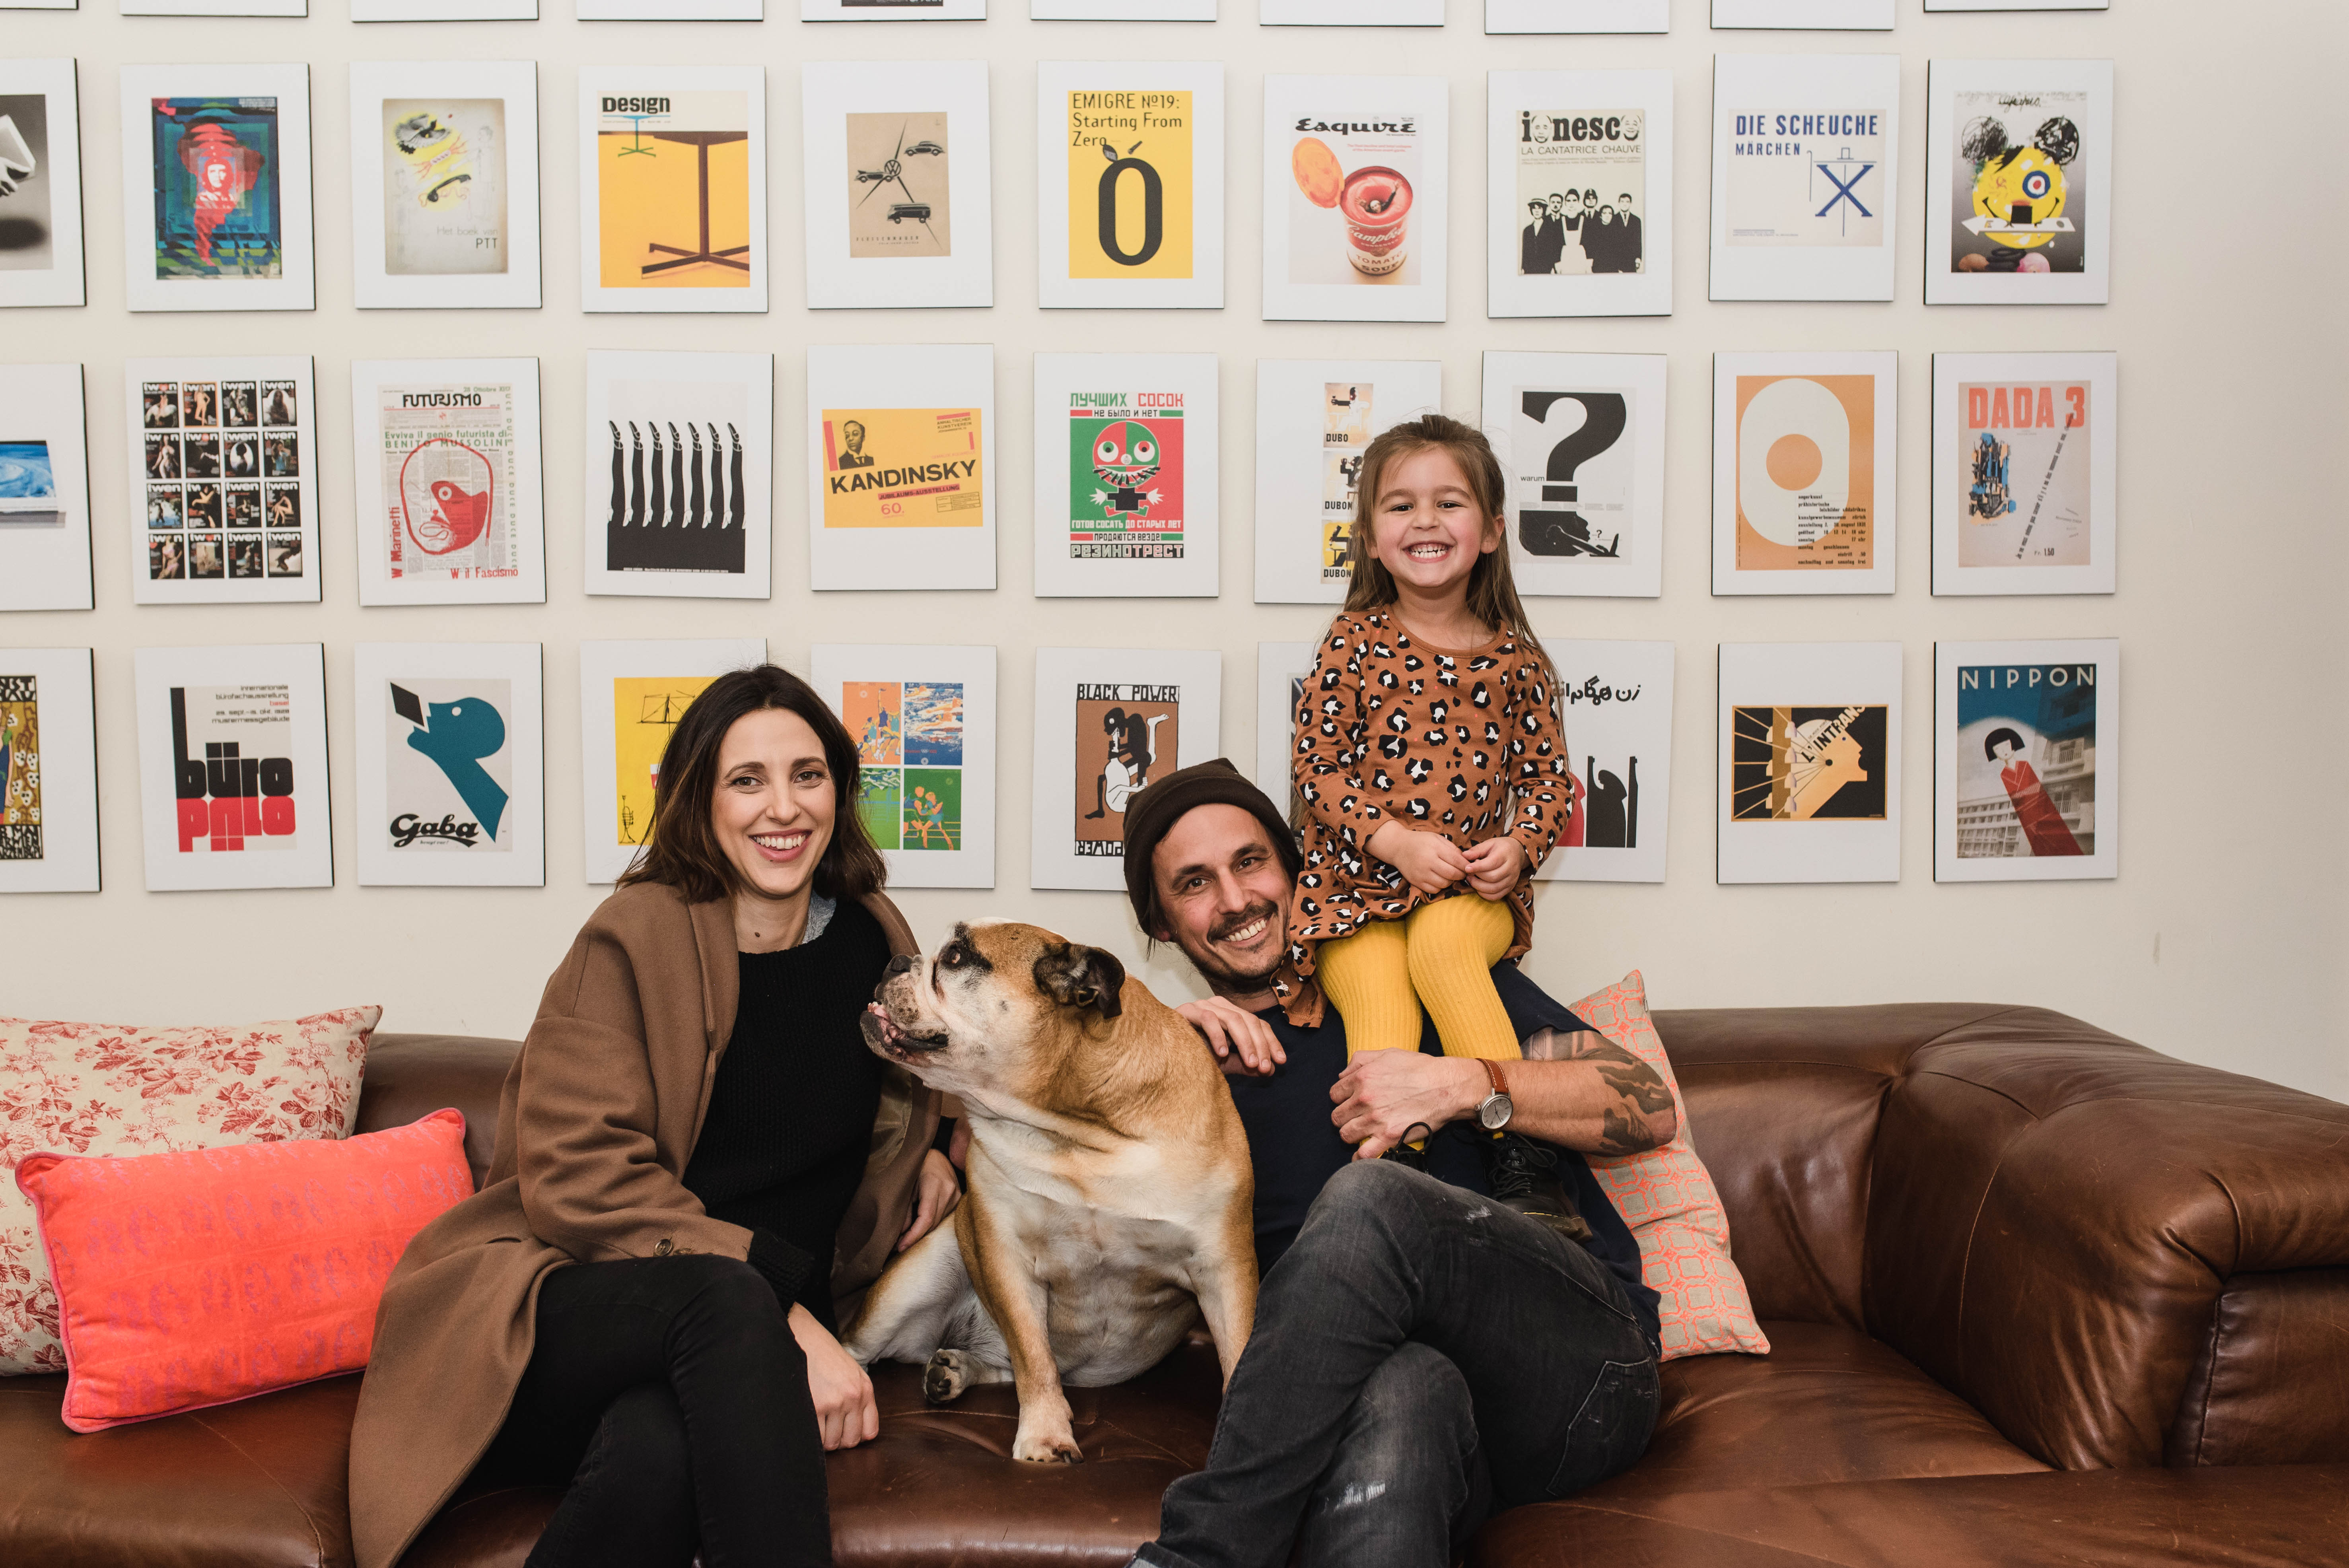 MEET: Symon(The Winning Dad) & Family